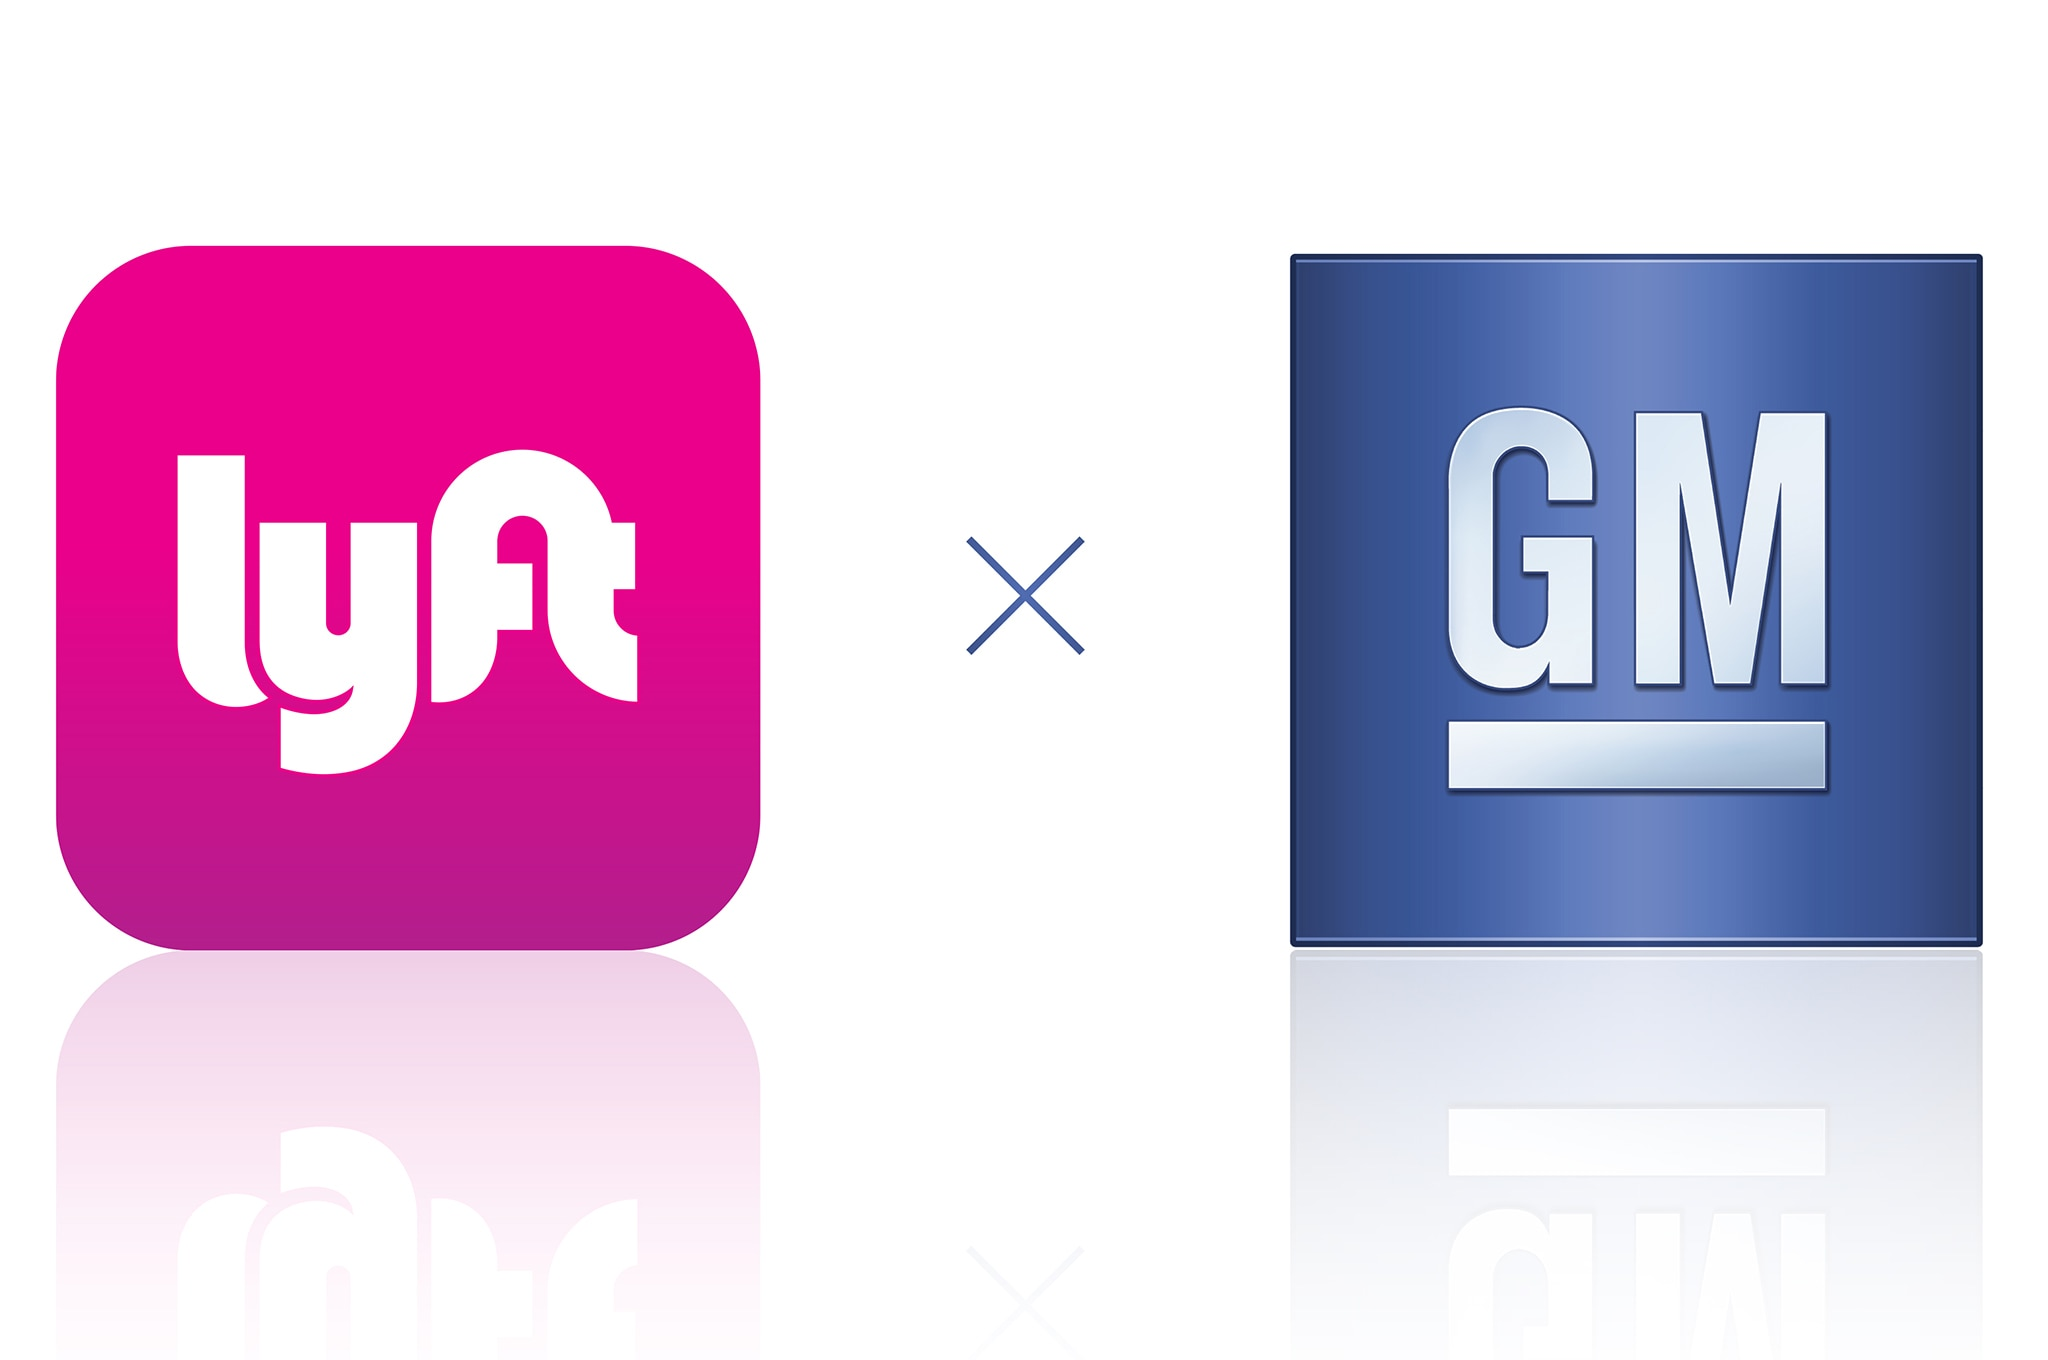 GM And Lyft Logos